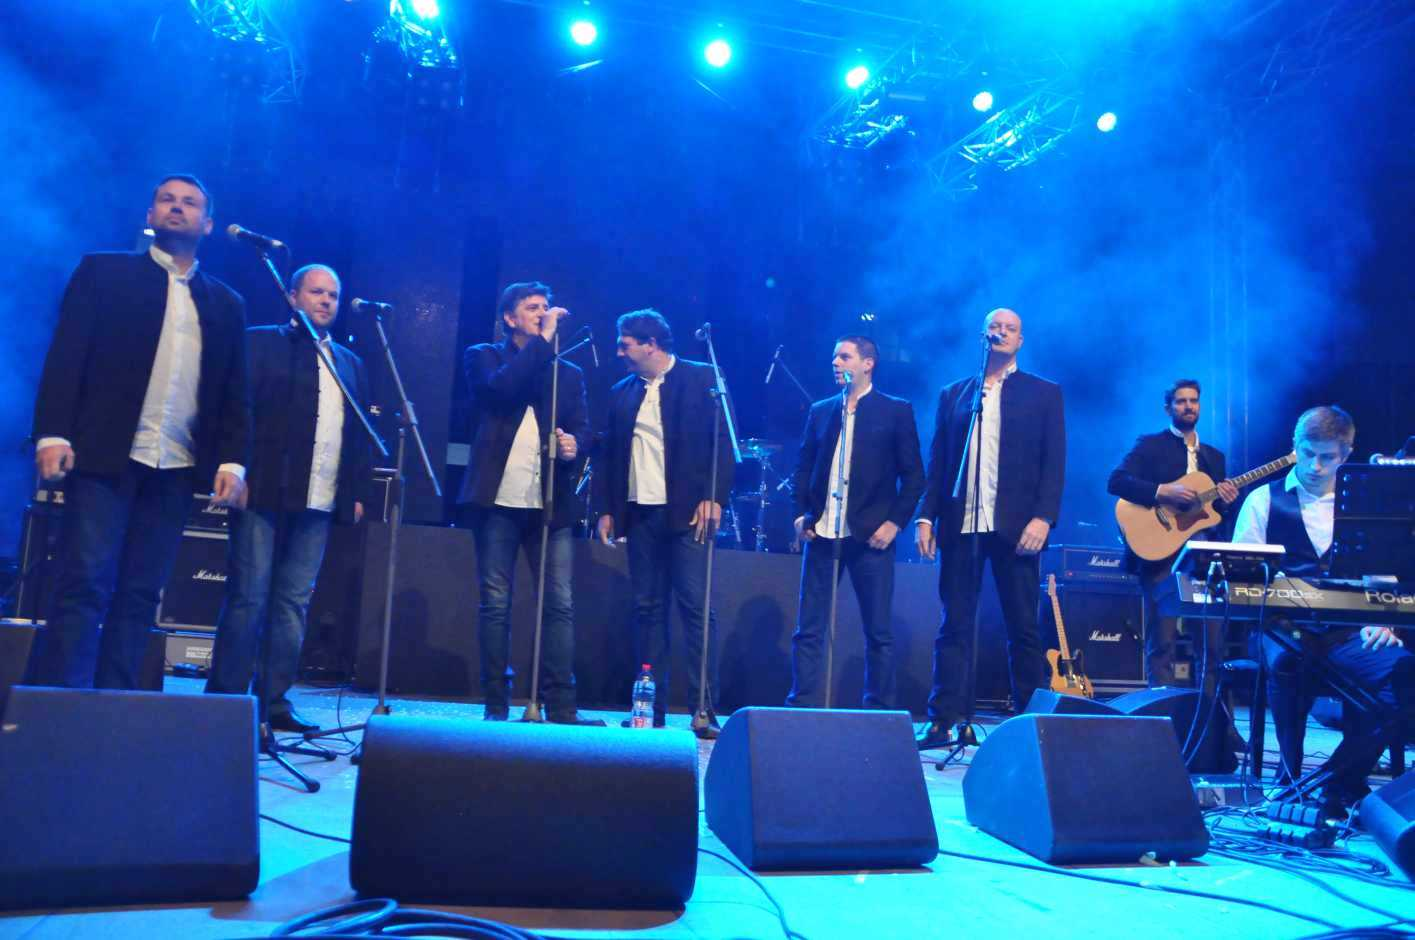 hrvatska-noc-2016-13